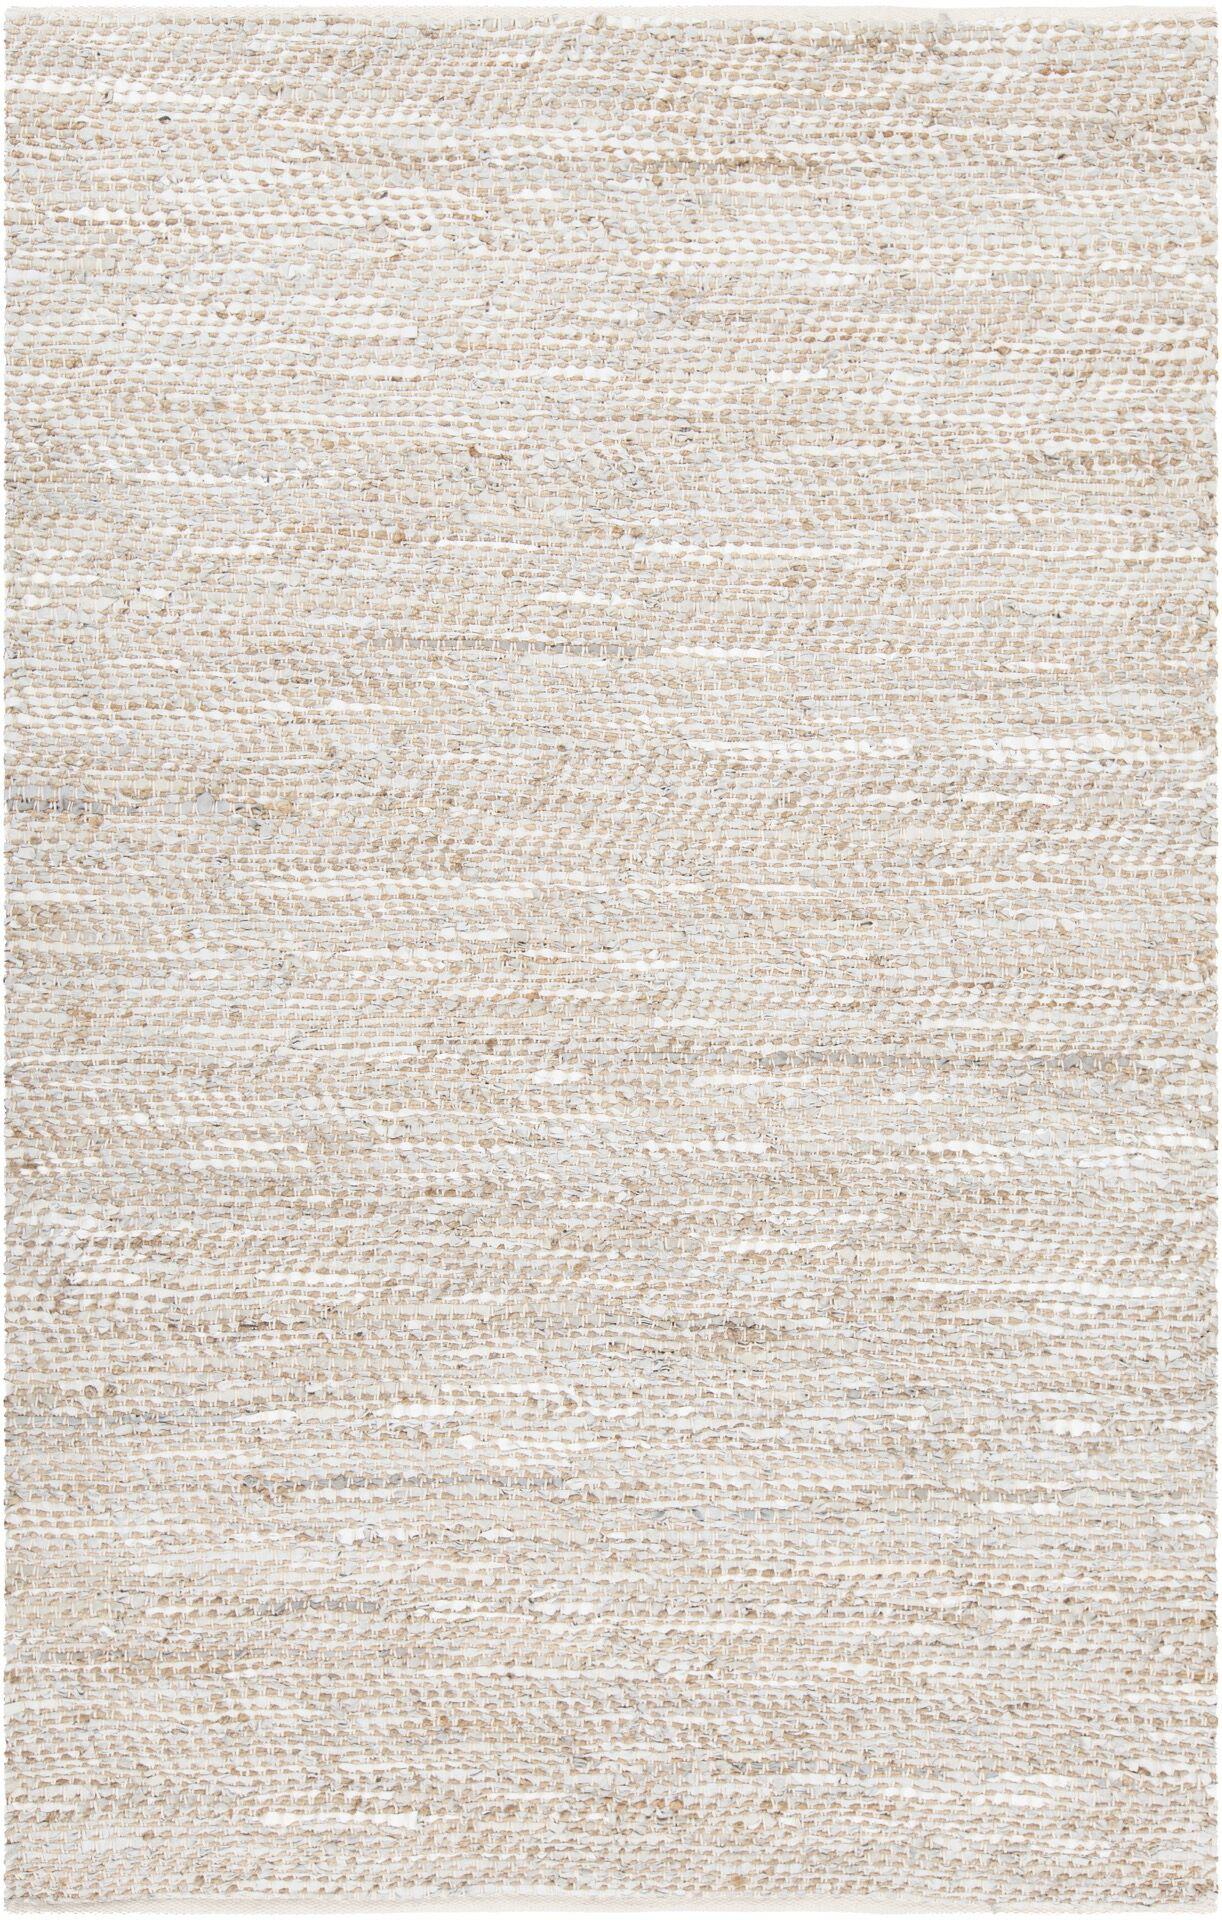 Polito Hand-Woven Silver Area Rug Rug Size: 5' x 7'6